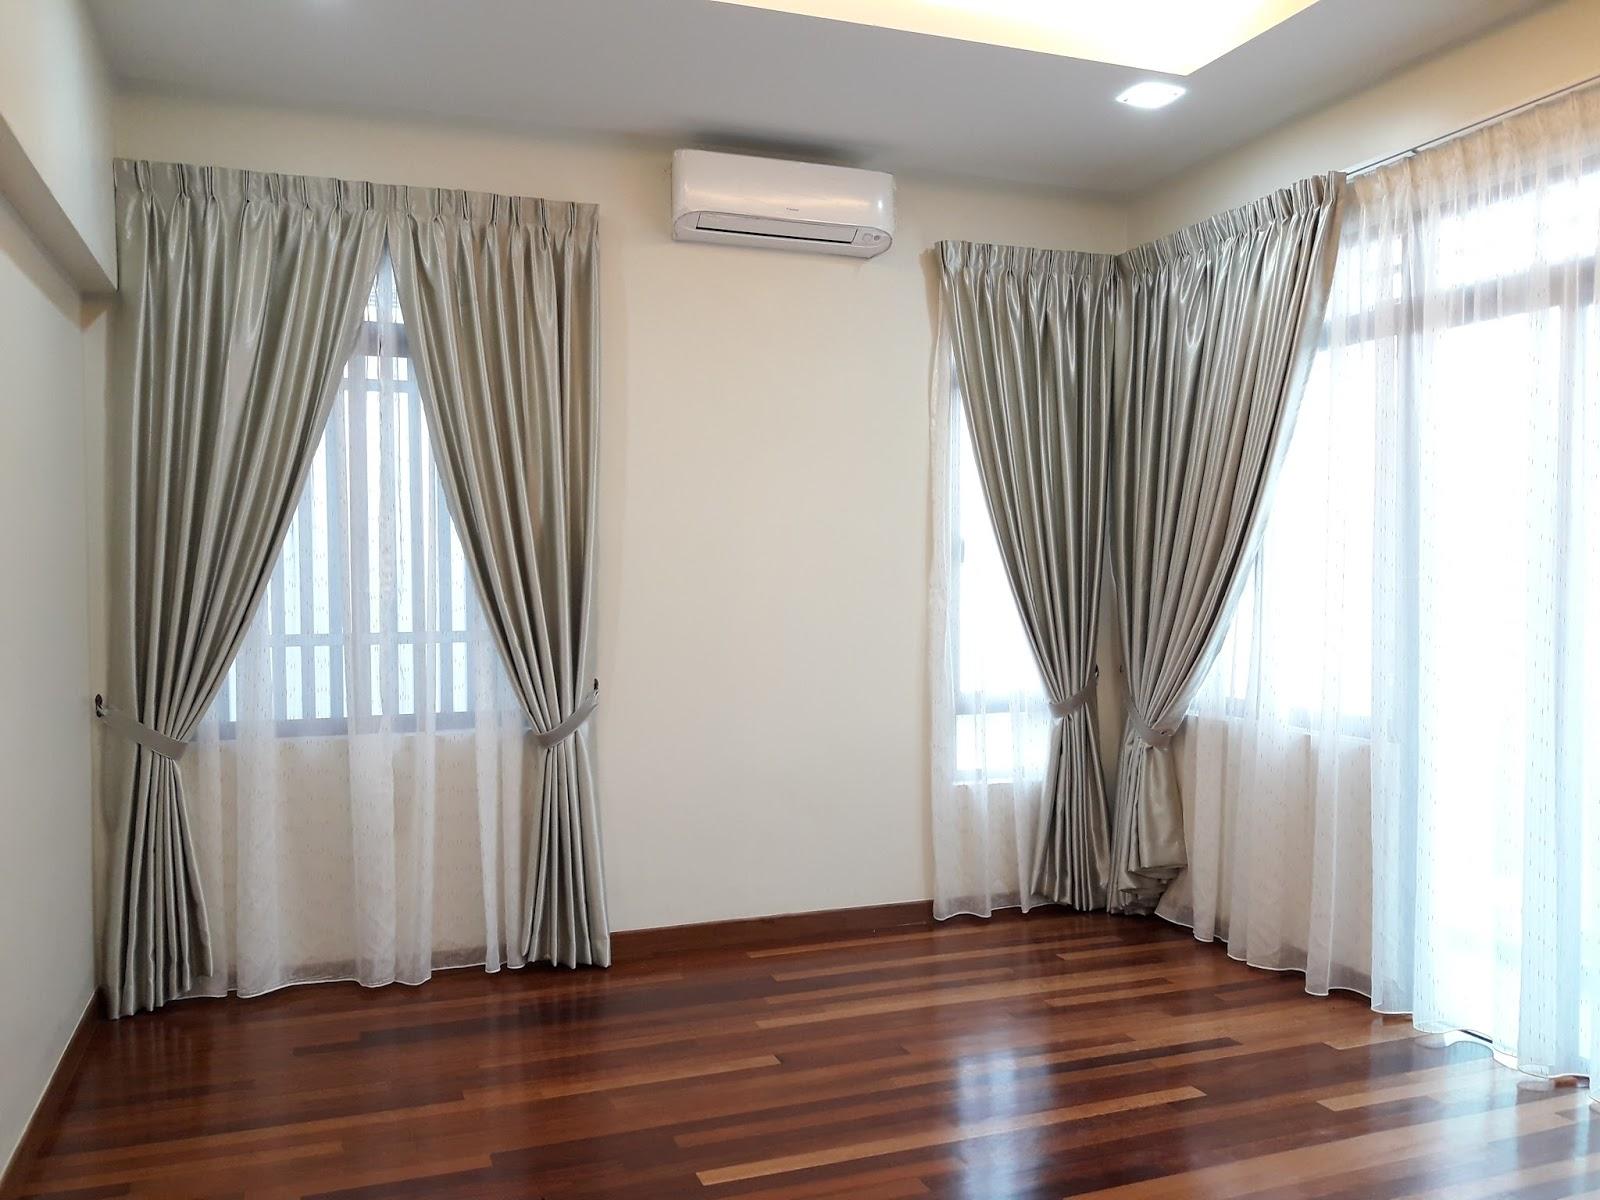 Trend Skrg Lgsir Moden Simple Ikut Bajet Tapi Sedap Mata Memandang Dn Kemas Utk Tmphn Rundingan W 011 11611627 Pn Saba Selangor Kl